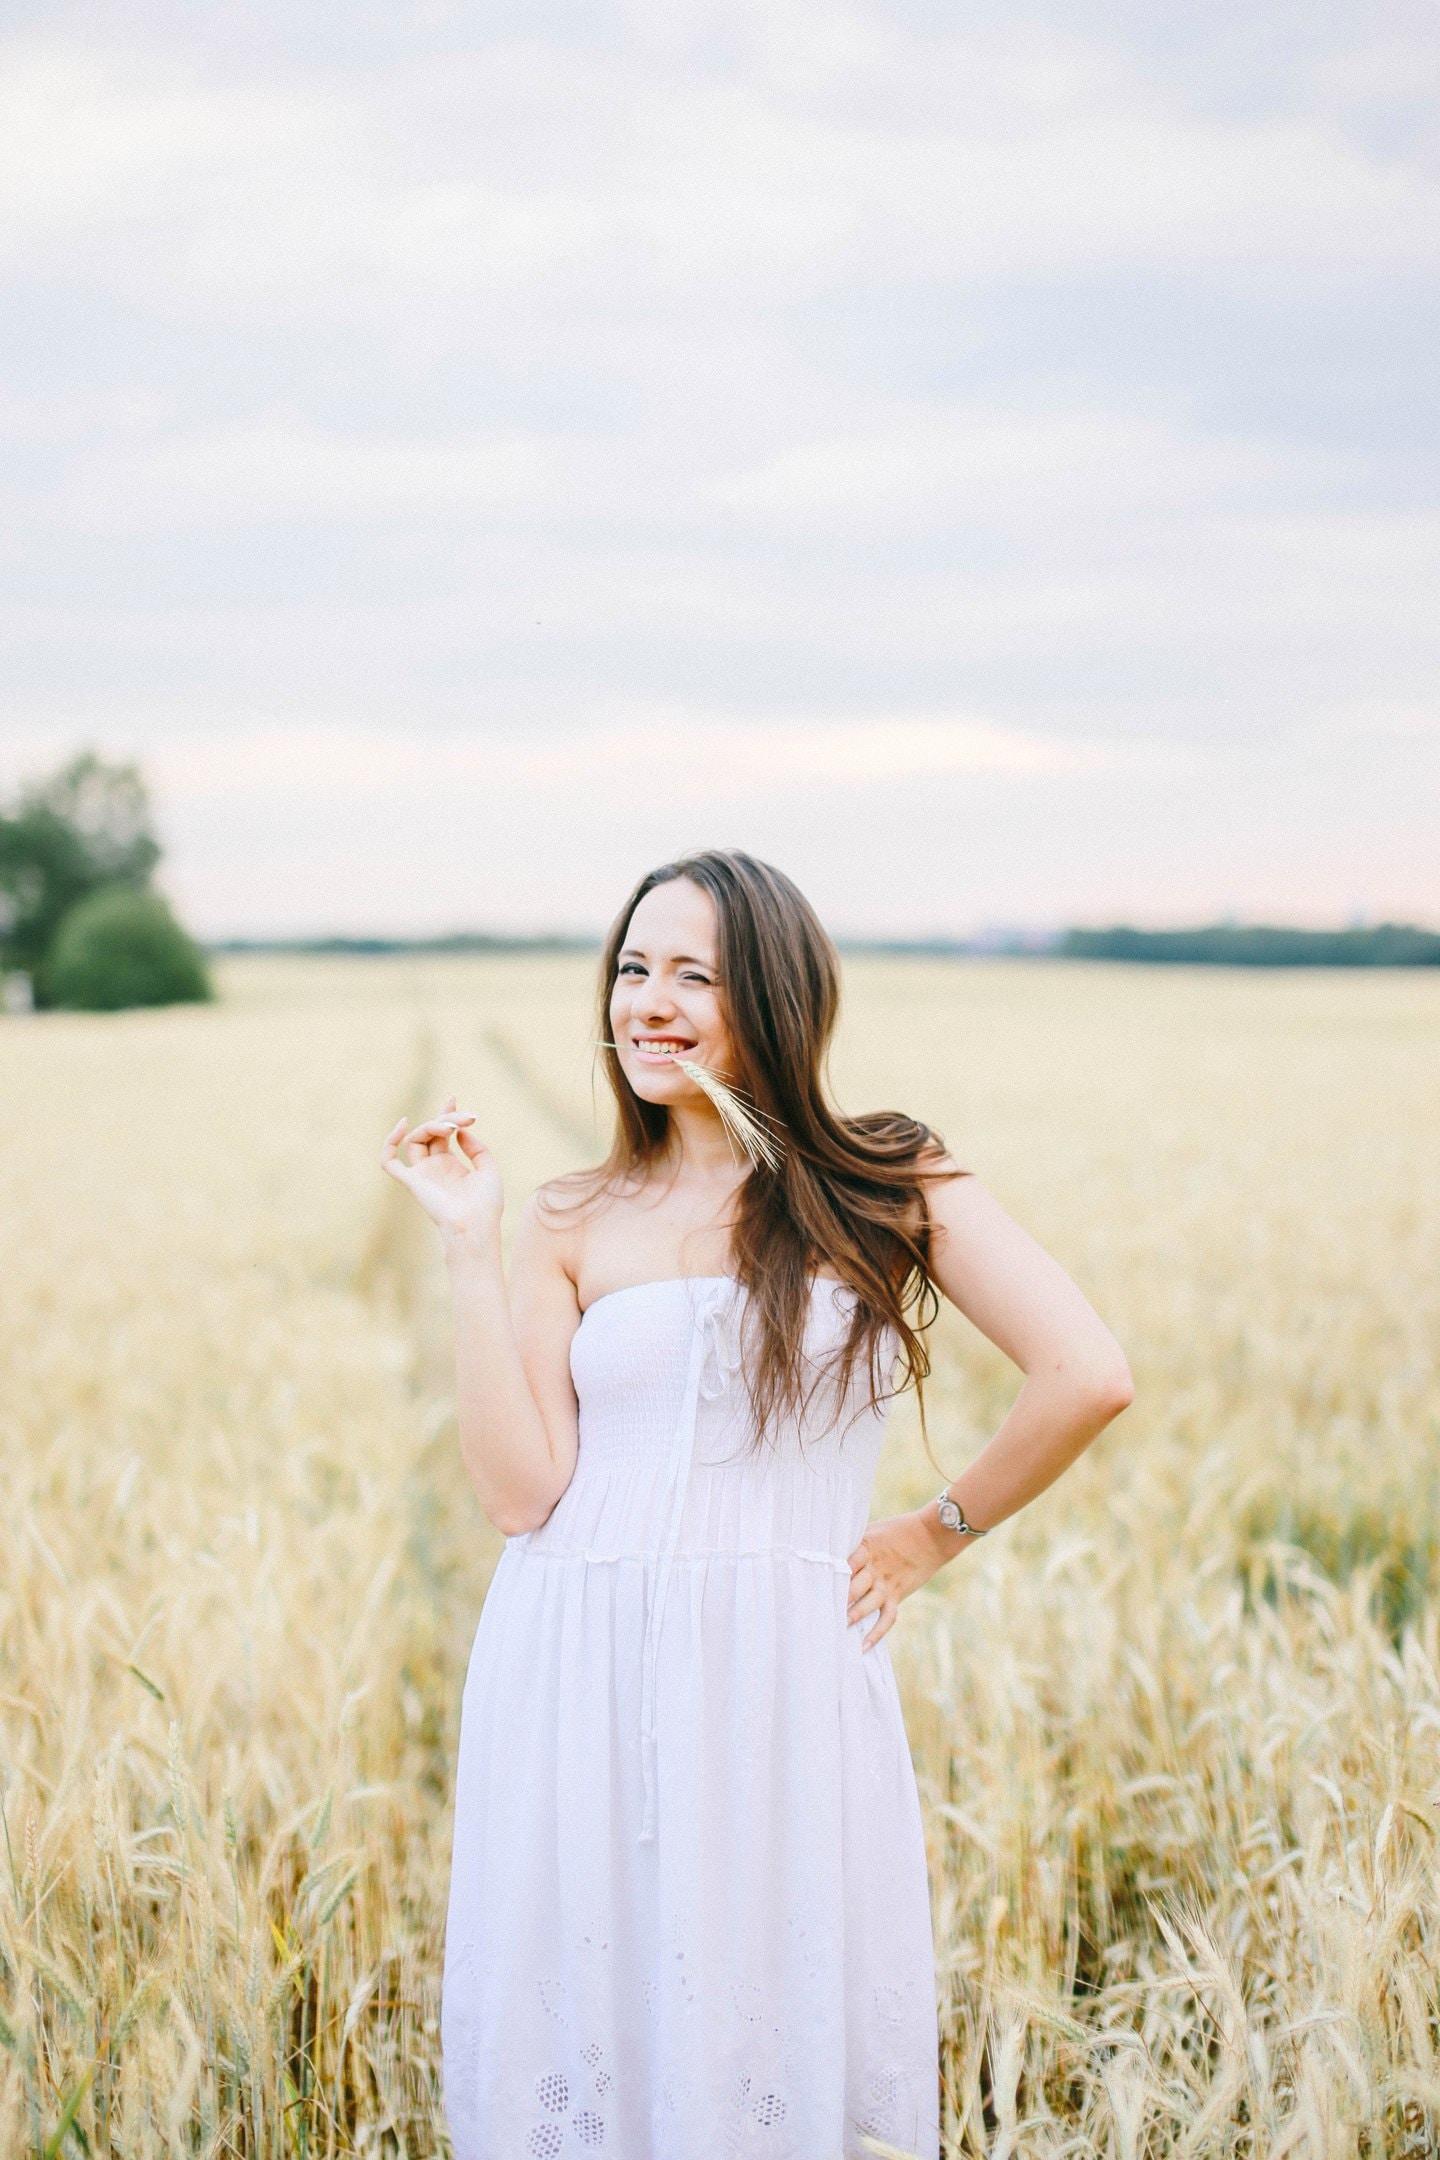 Go to Elena Rabkina's profile